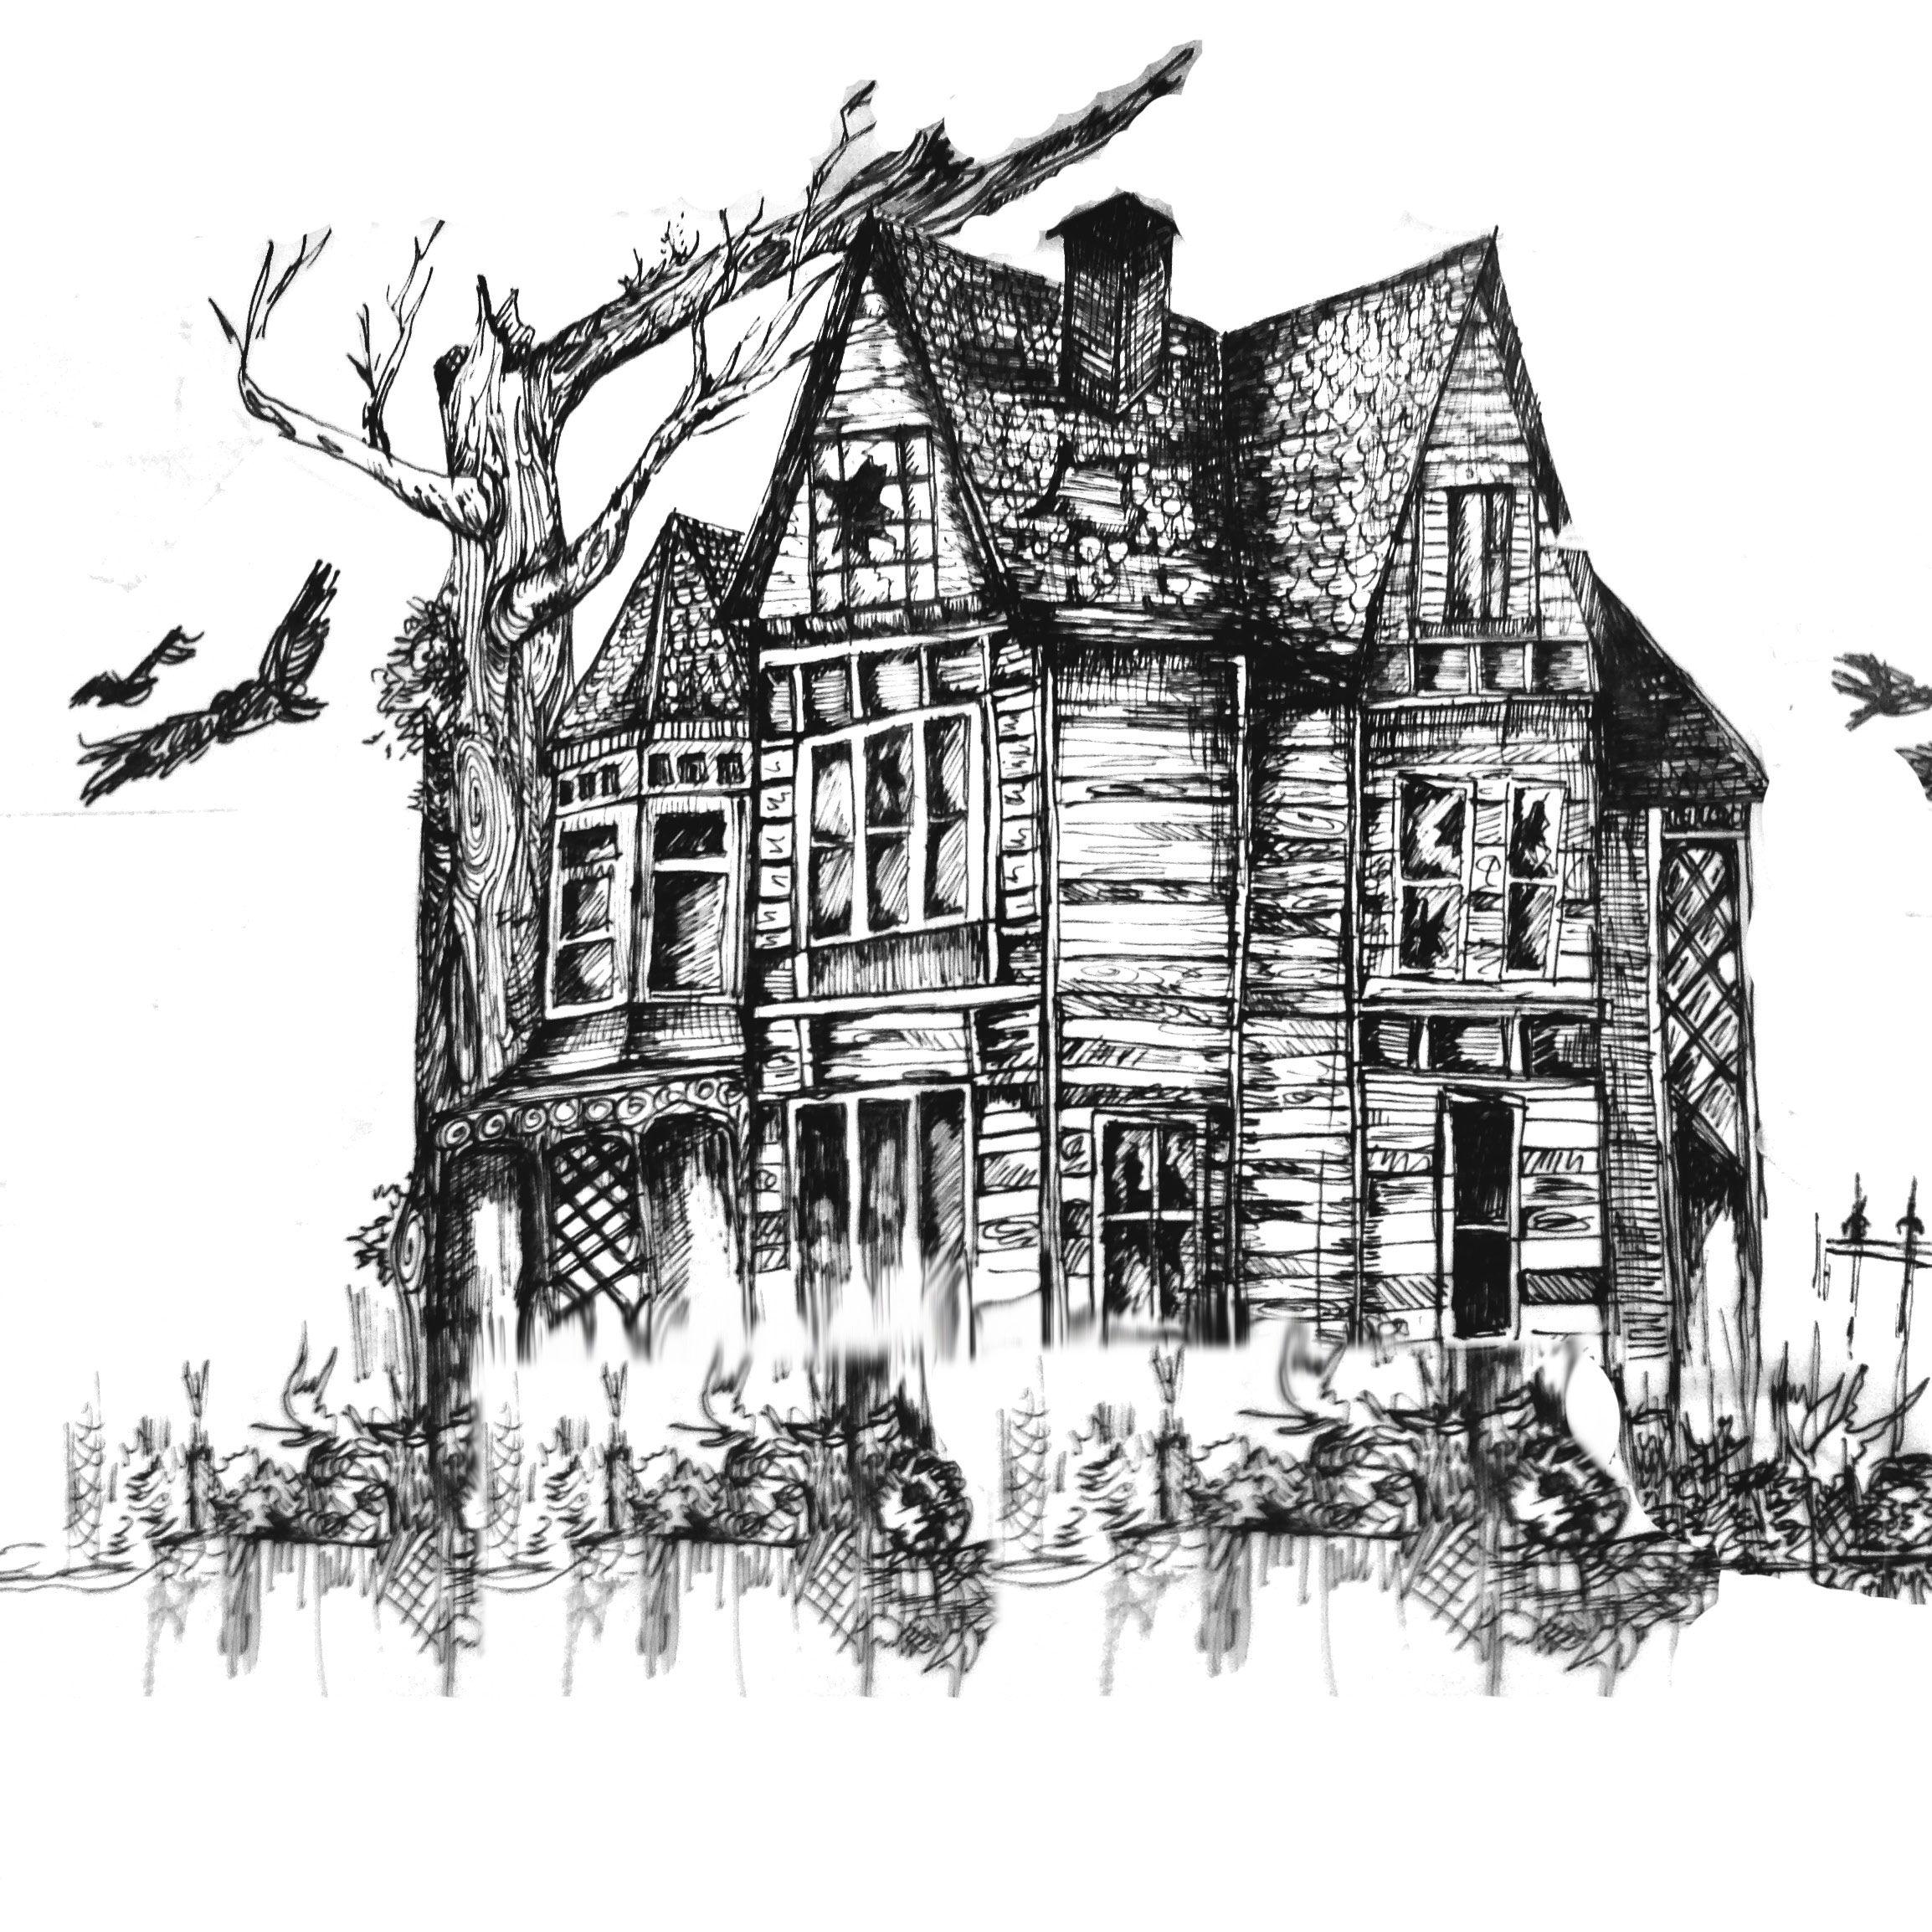 Haunted House Illustration Series